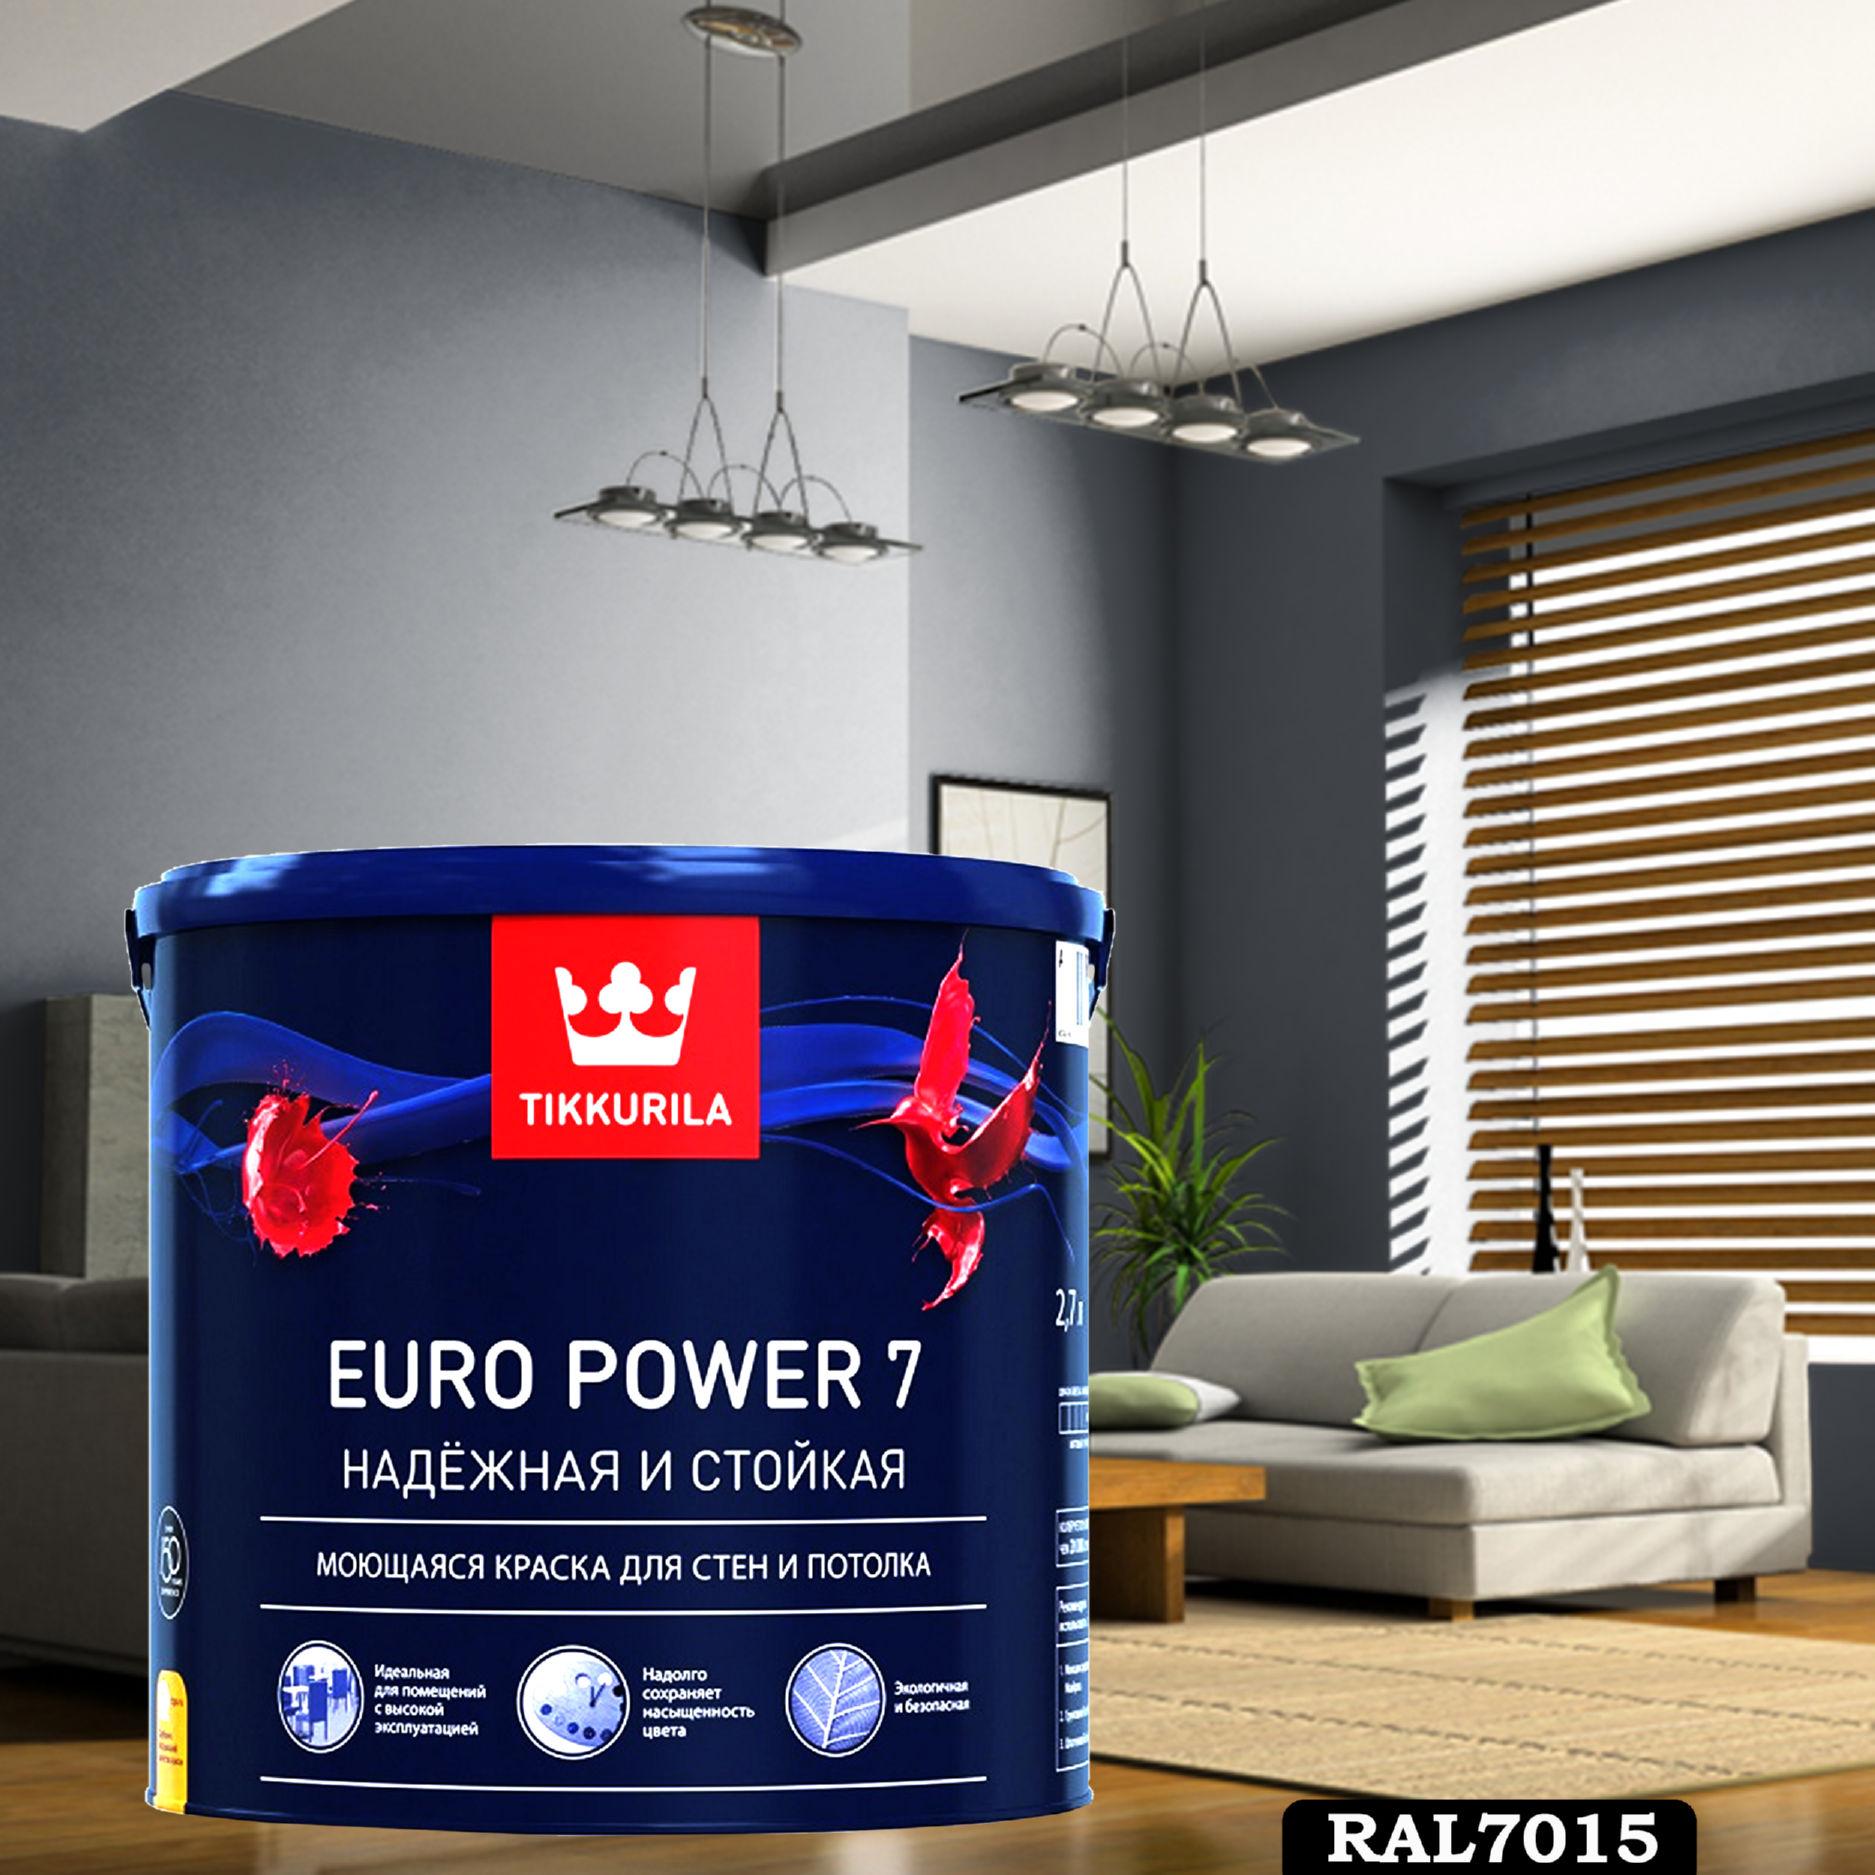 Фото 14 - Краска TIKKURILA Euro Power 7,  RAL 7015 Серый-сланец, латексная моющаяся матовая интерьерная, 9 л.